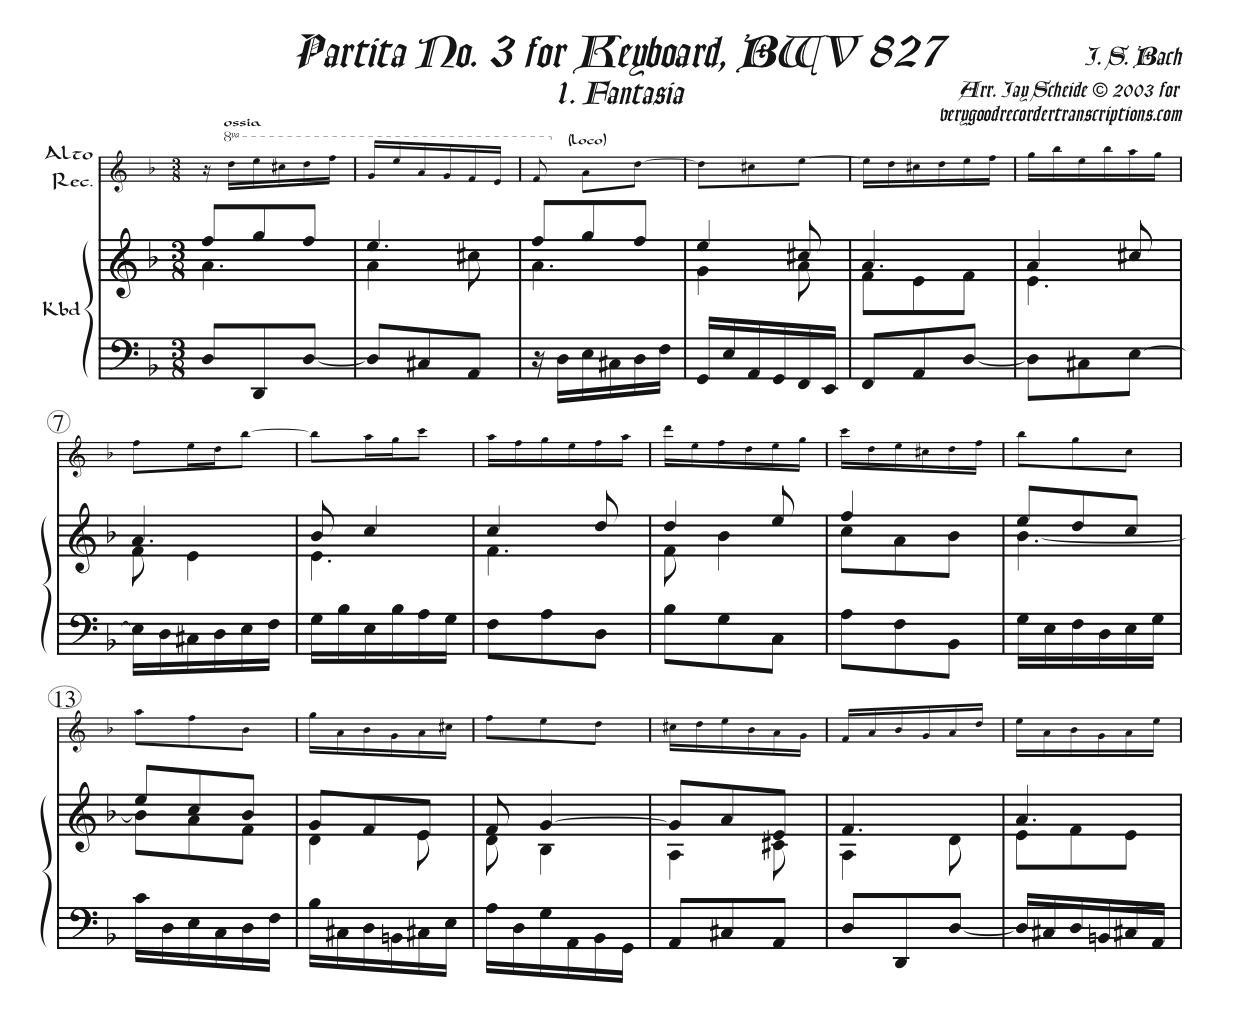 Partita No. 3 Complete, BWV 827